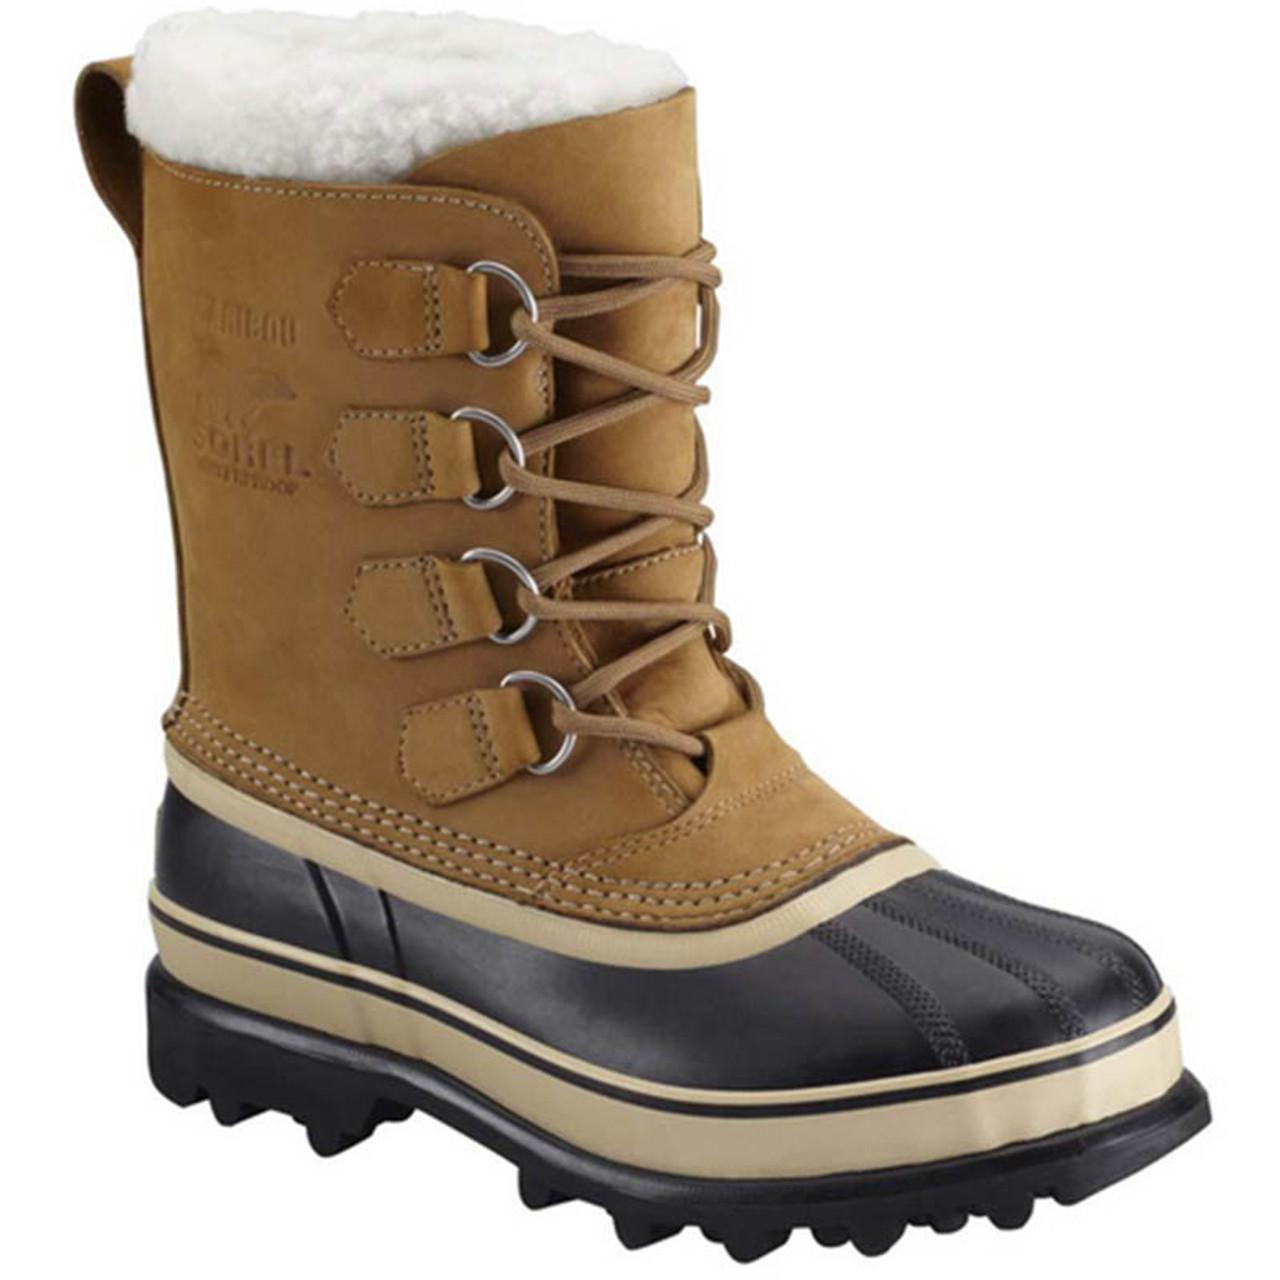 Sorel 1003812,280 Women\u0027s CARIBOU Winter Snow Boots